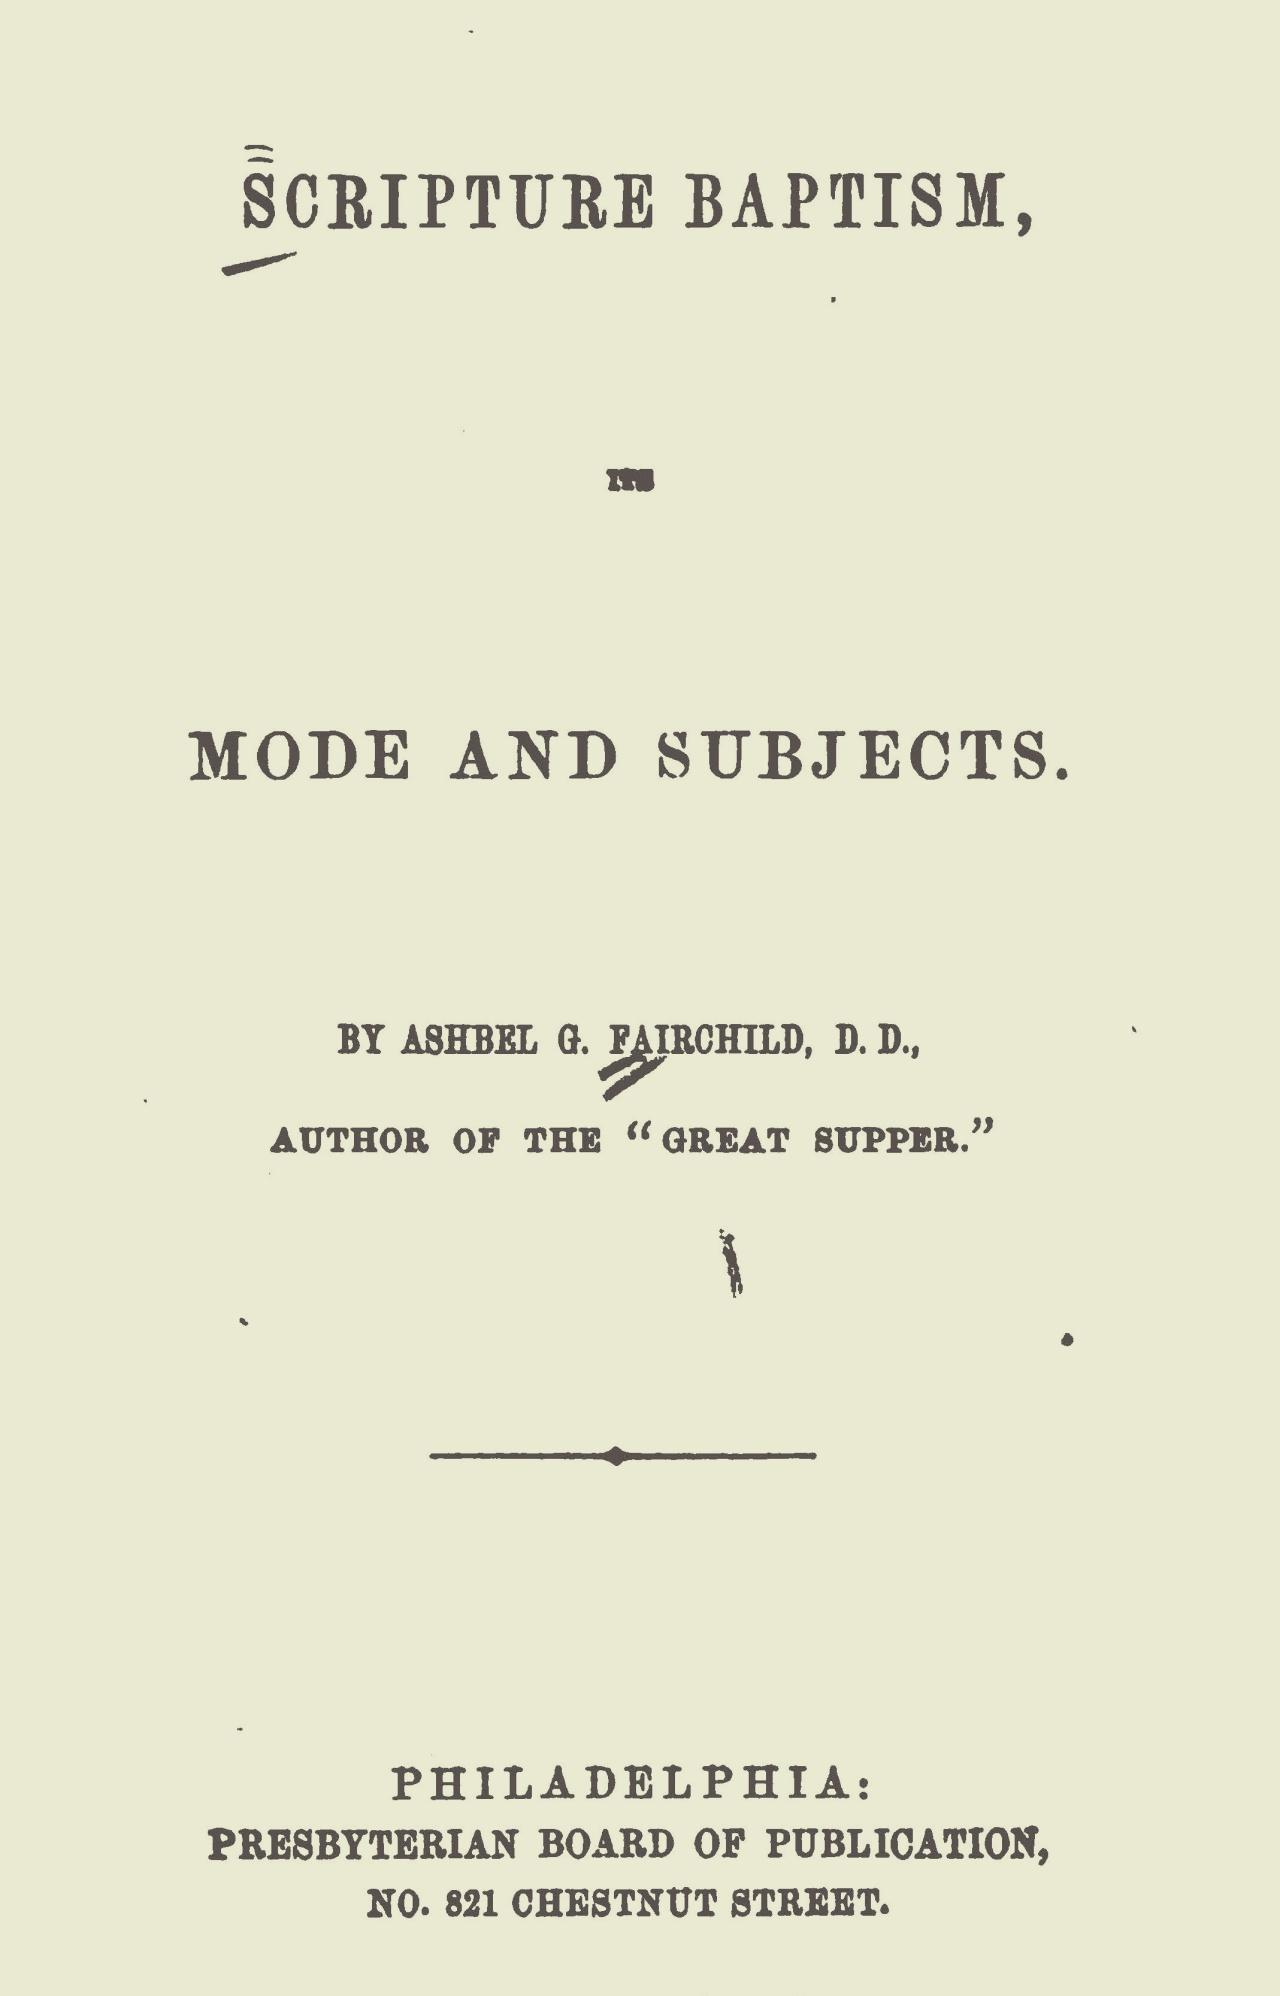 Fairchild, Ashbel Green, Scripture Baptism Title Page.jpg